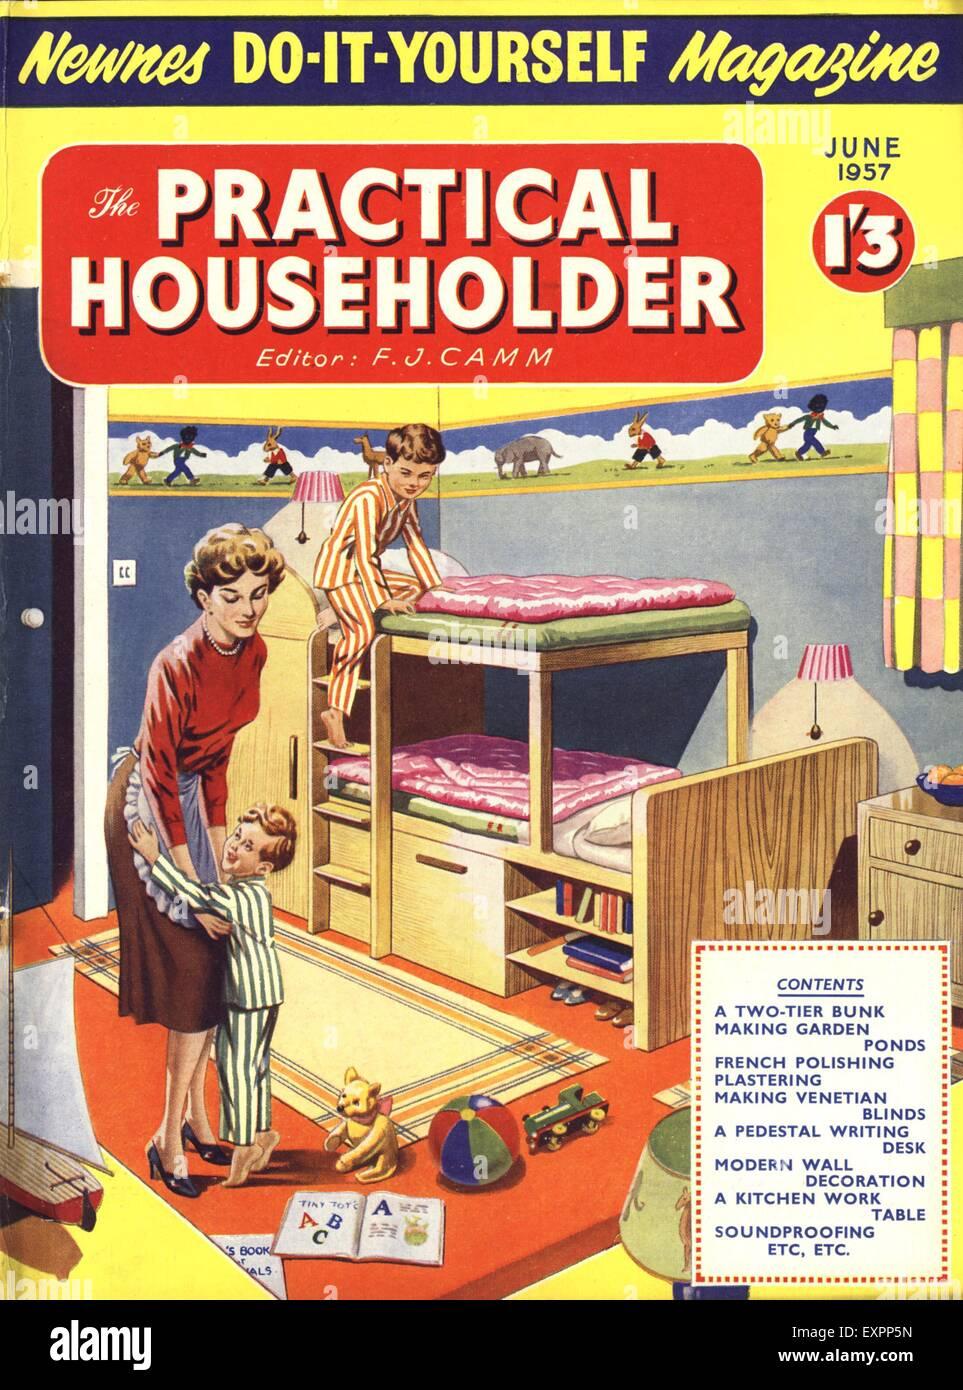 1950s uk woman magazine cover stock photos 1950s uk woman magazine 1950s uk practical householder magazine cover stock image solutioingenieria Image collections